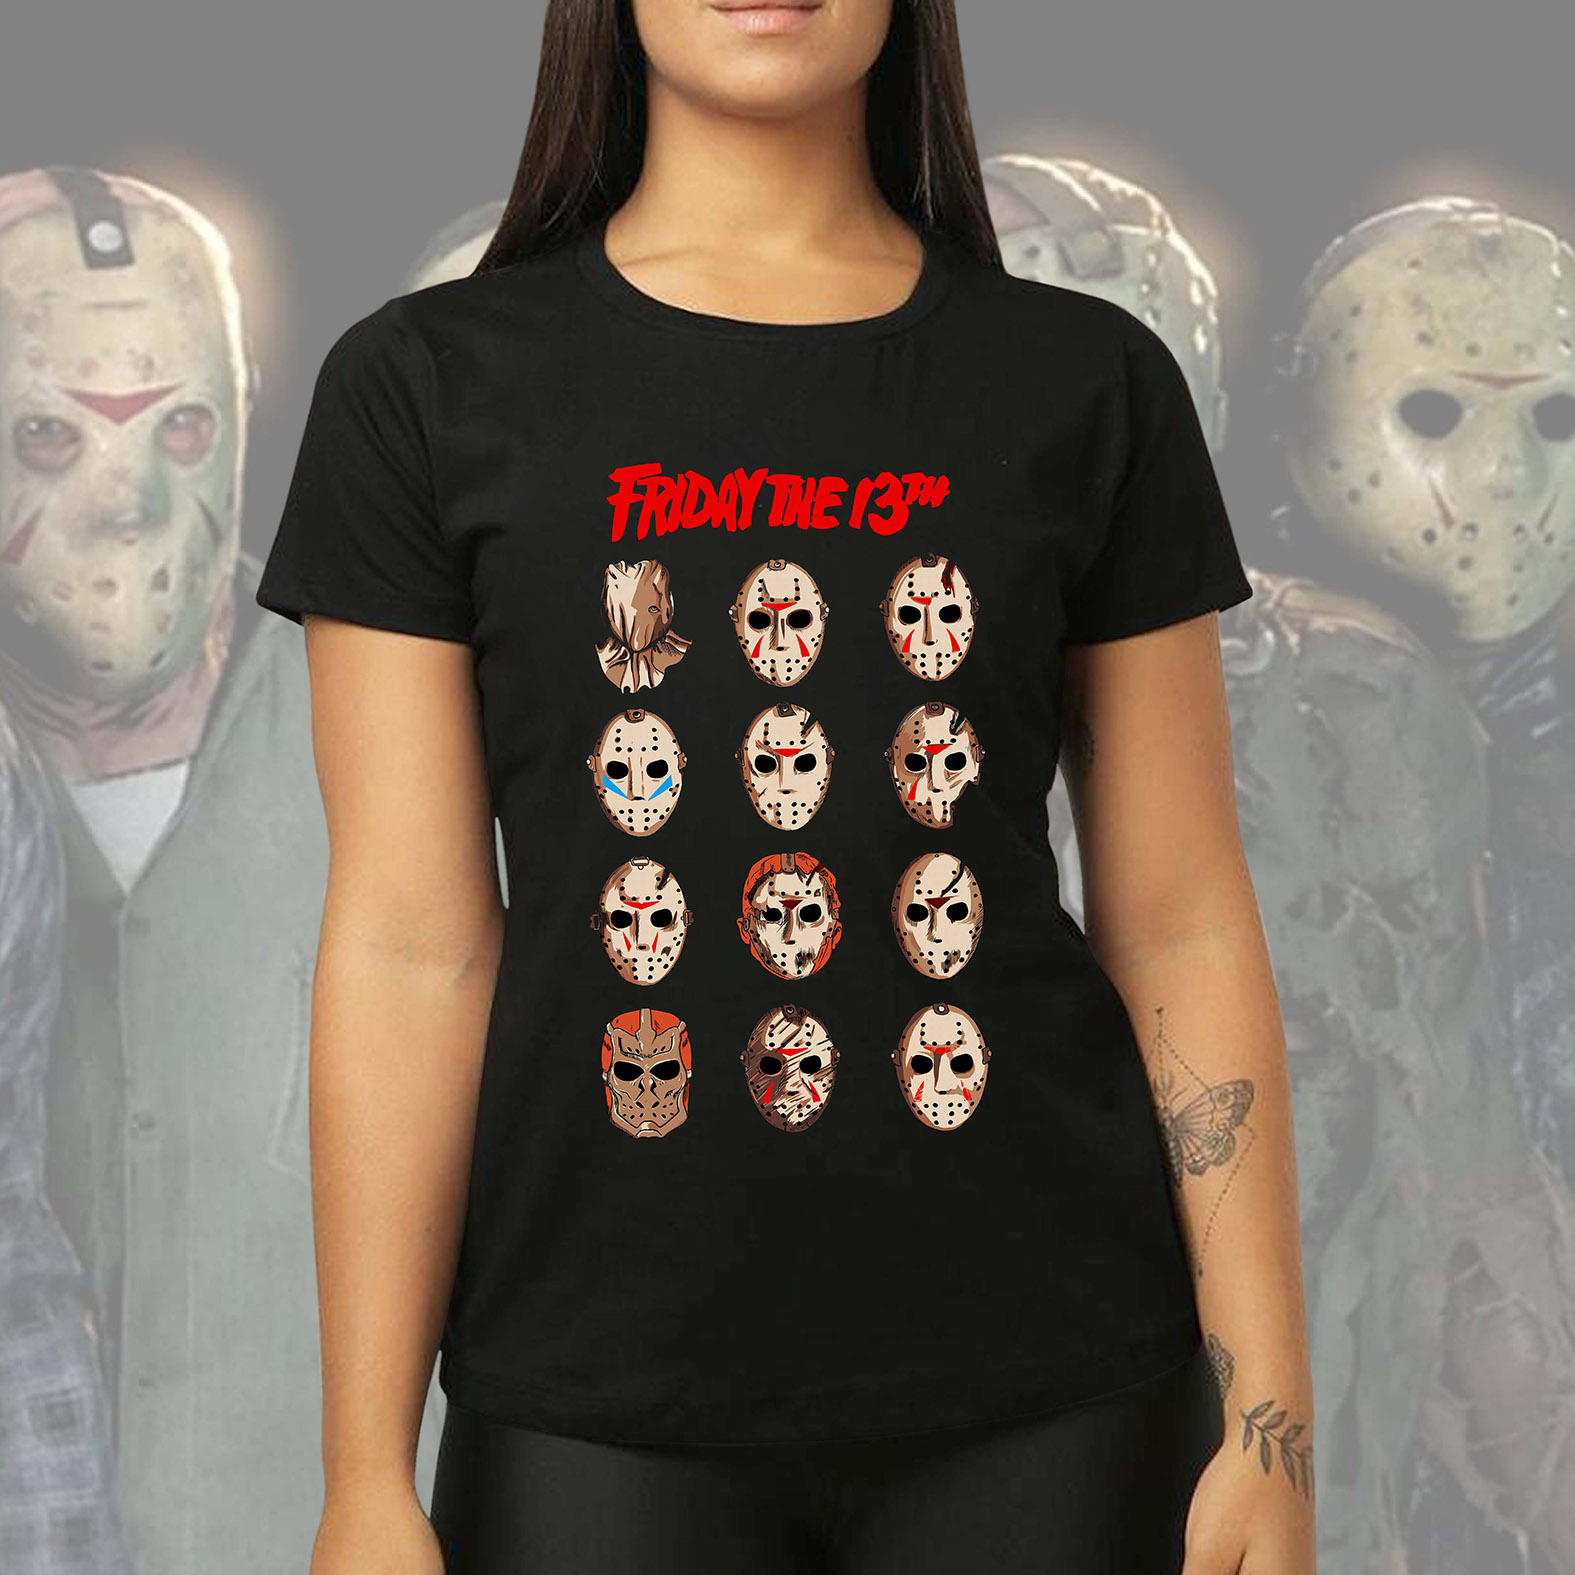 Camiseta Feminina Unissex Jason Voorhees Friday The 13th Sexta Feira 13 Terror Horror Serial Killer (Preta) - EV